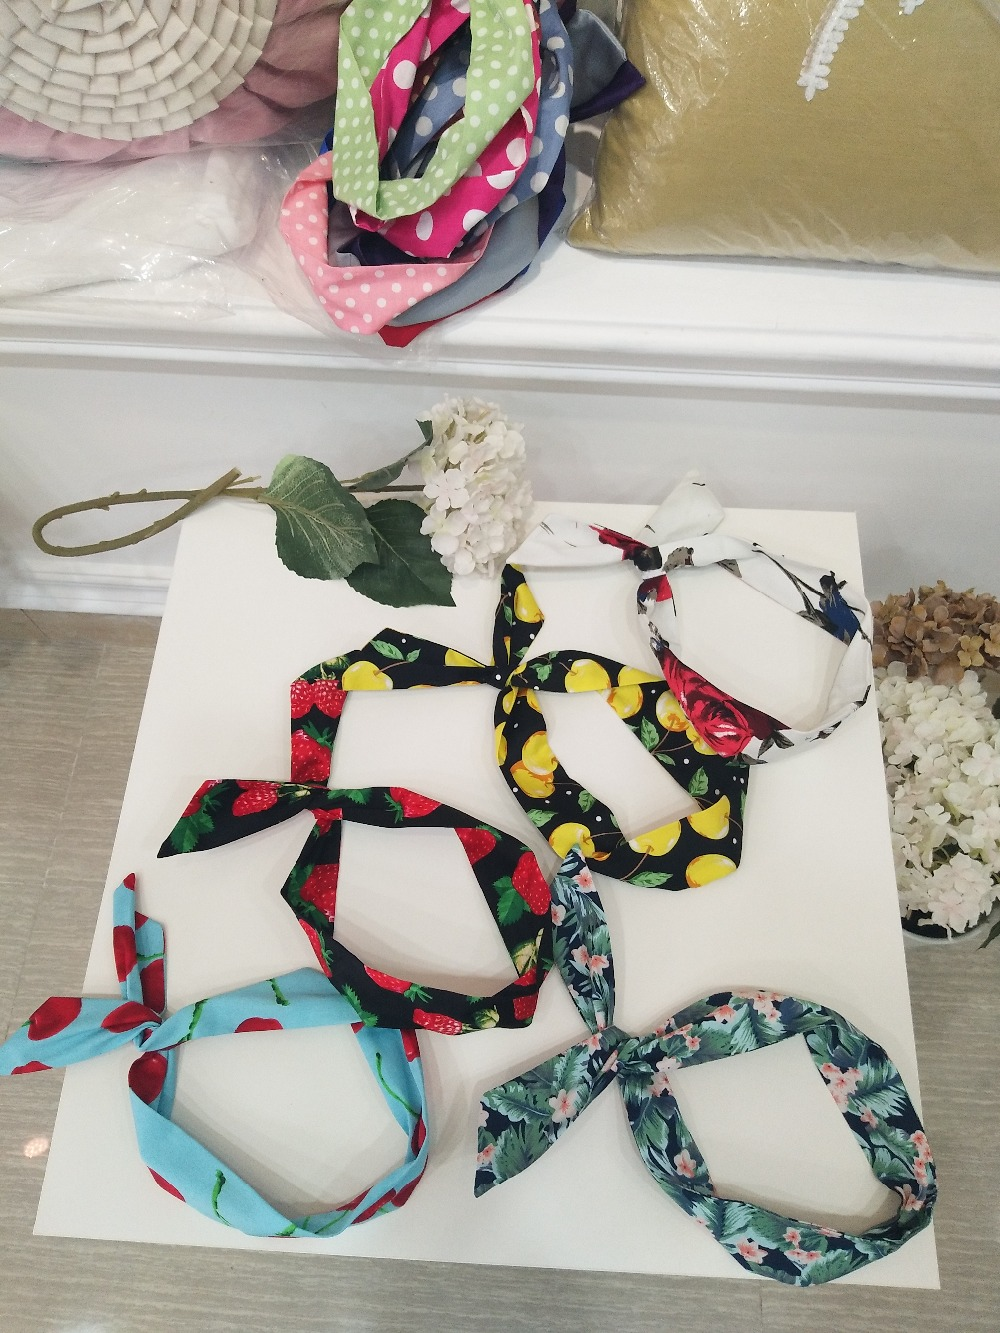 5pcs/lot Vintage Dot Floral Print Wire Headband Pinup Rockabilly Head Wrap Scarf Wholesa ...